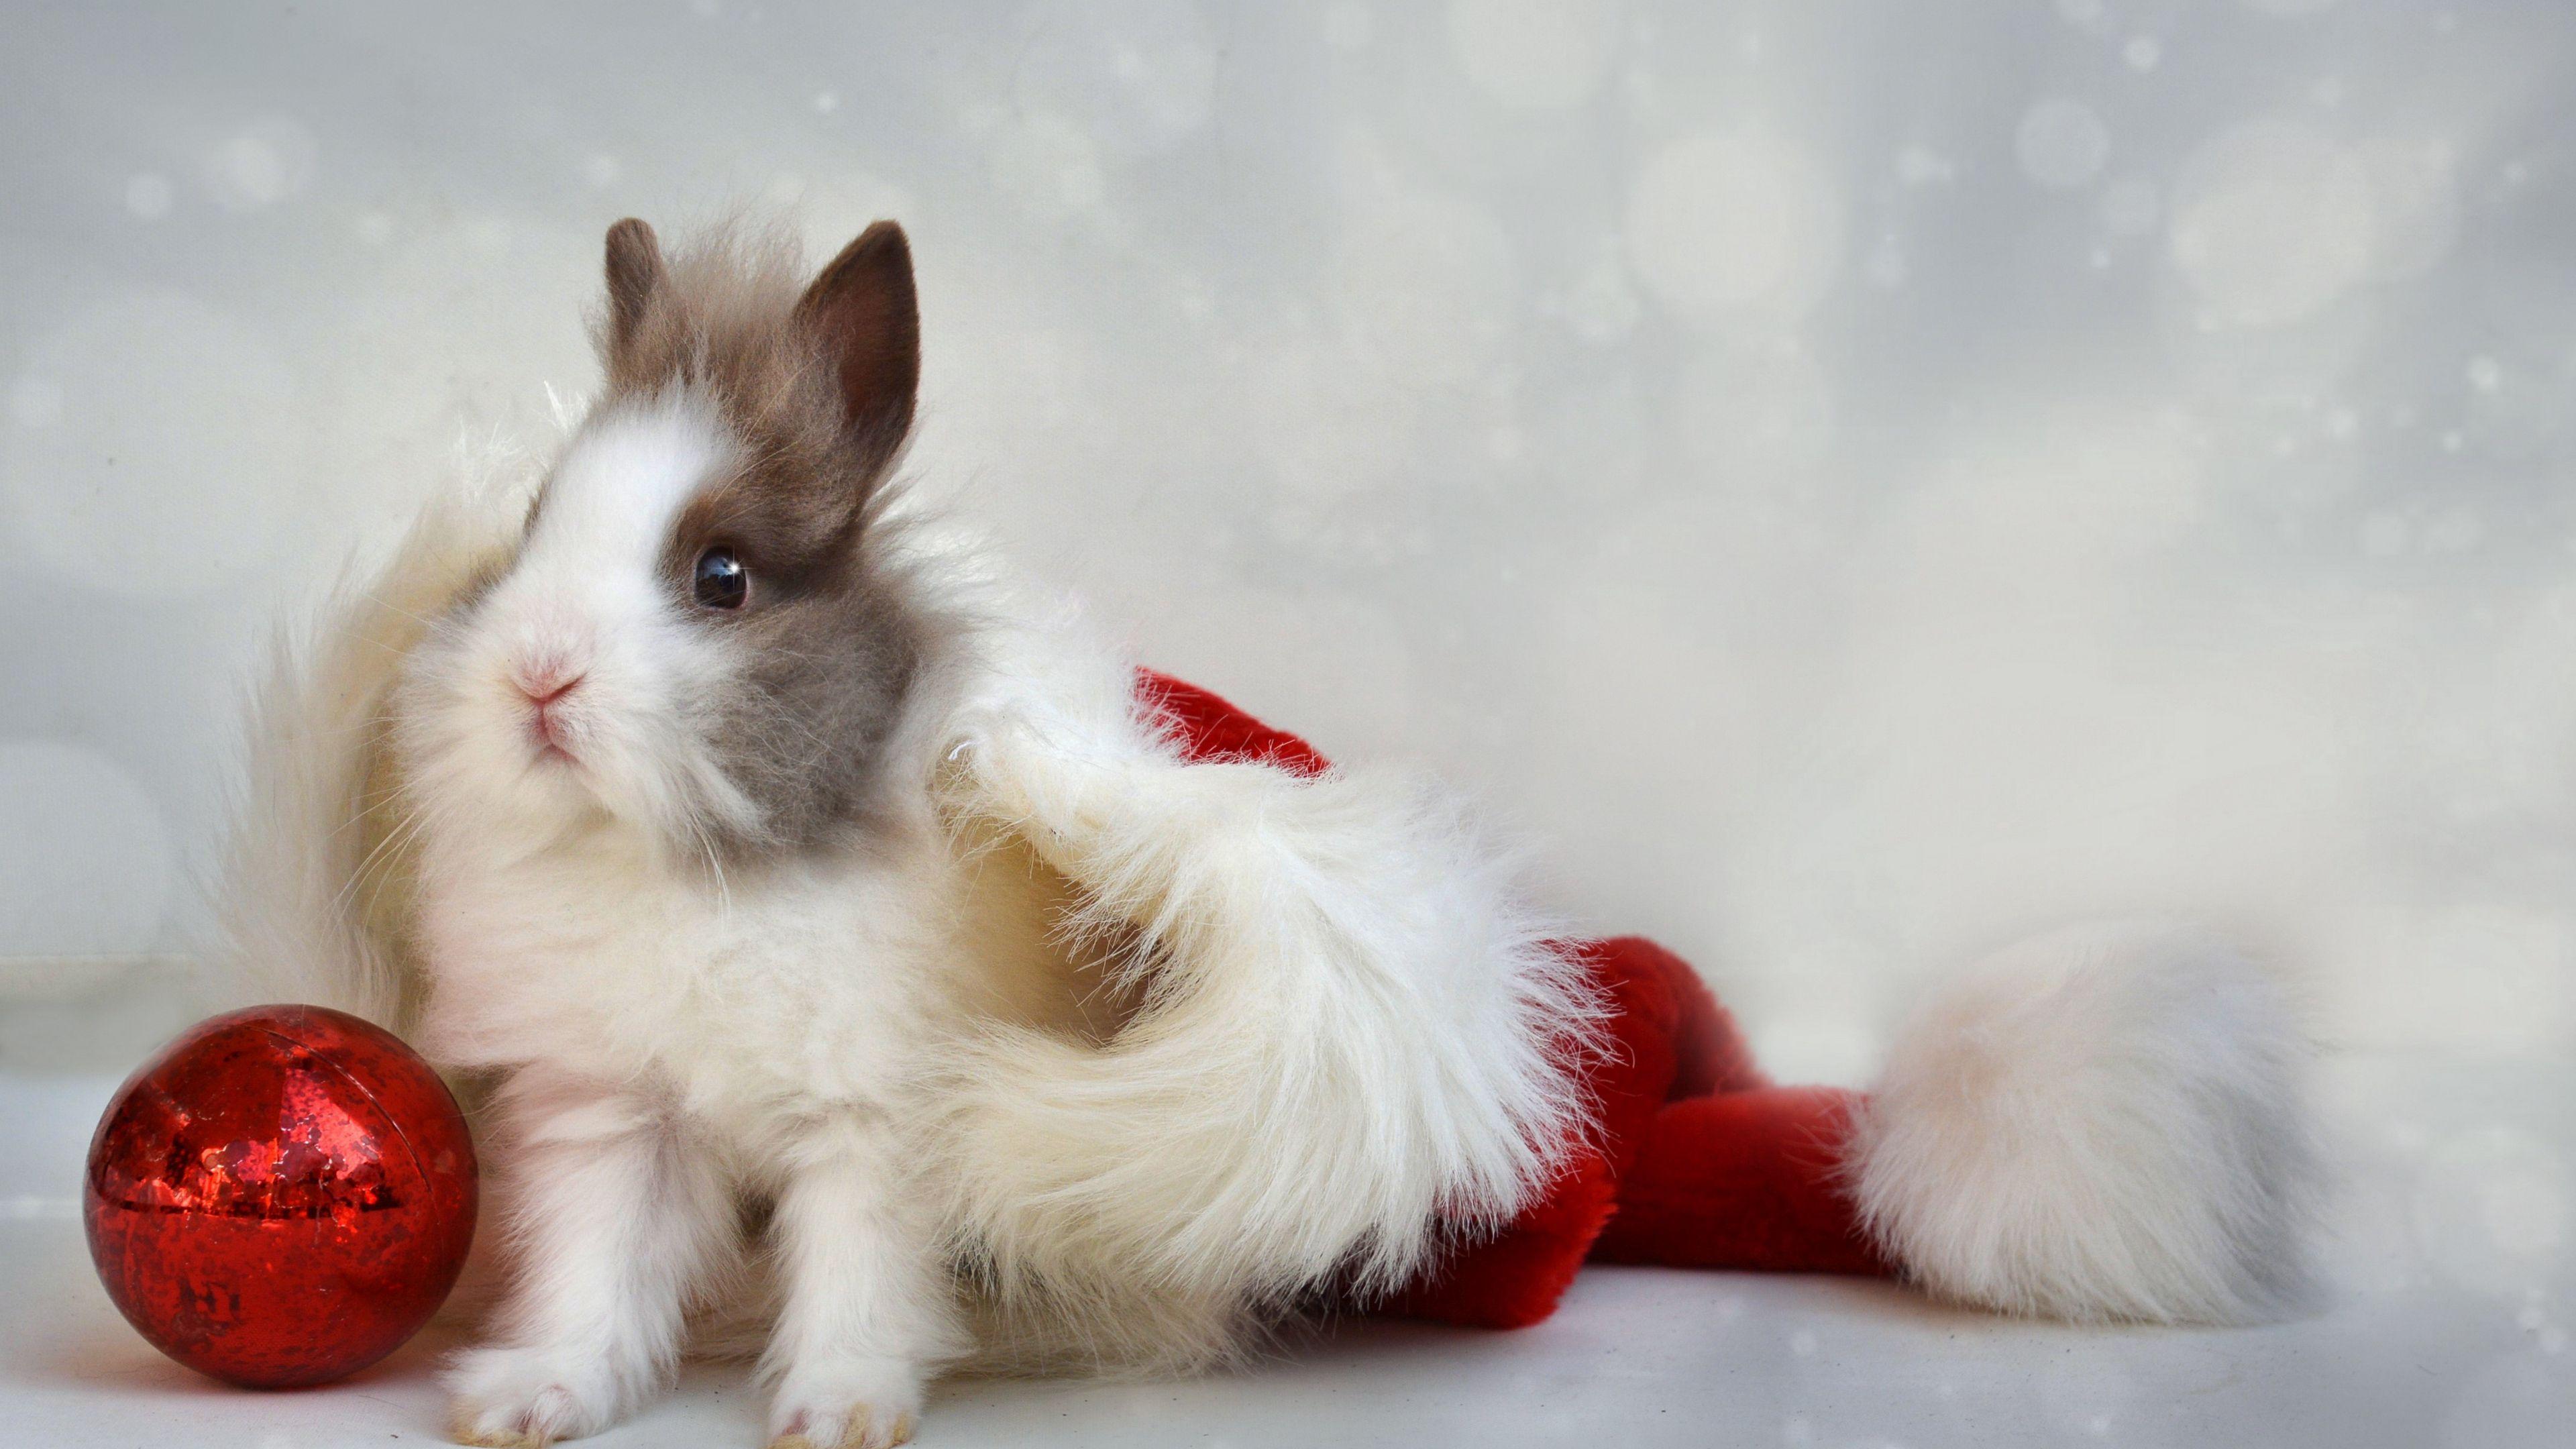 Rabbit New Year Ball 4k Rabbit New Year Ball Rabbit Holiday Wallpaper Christmas Photography